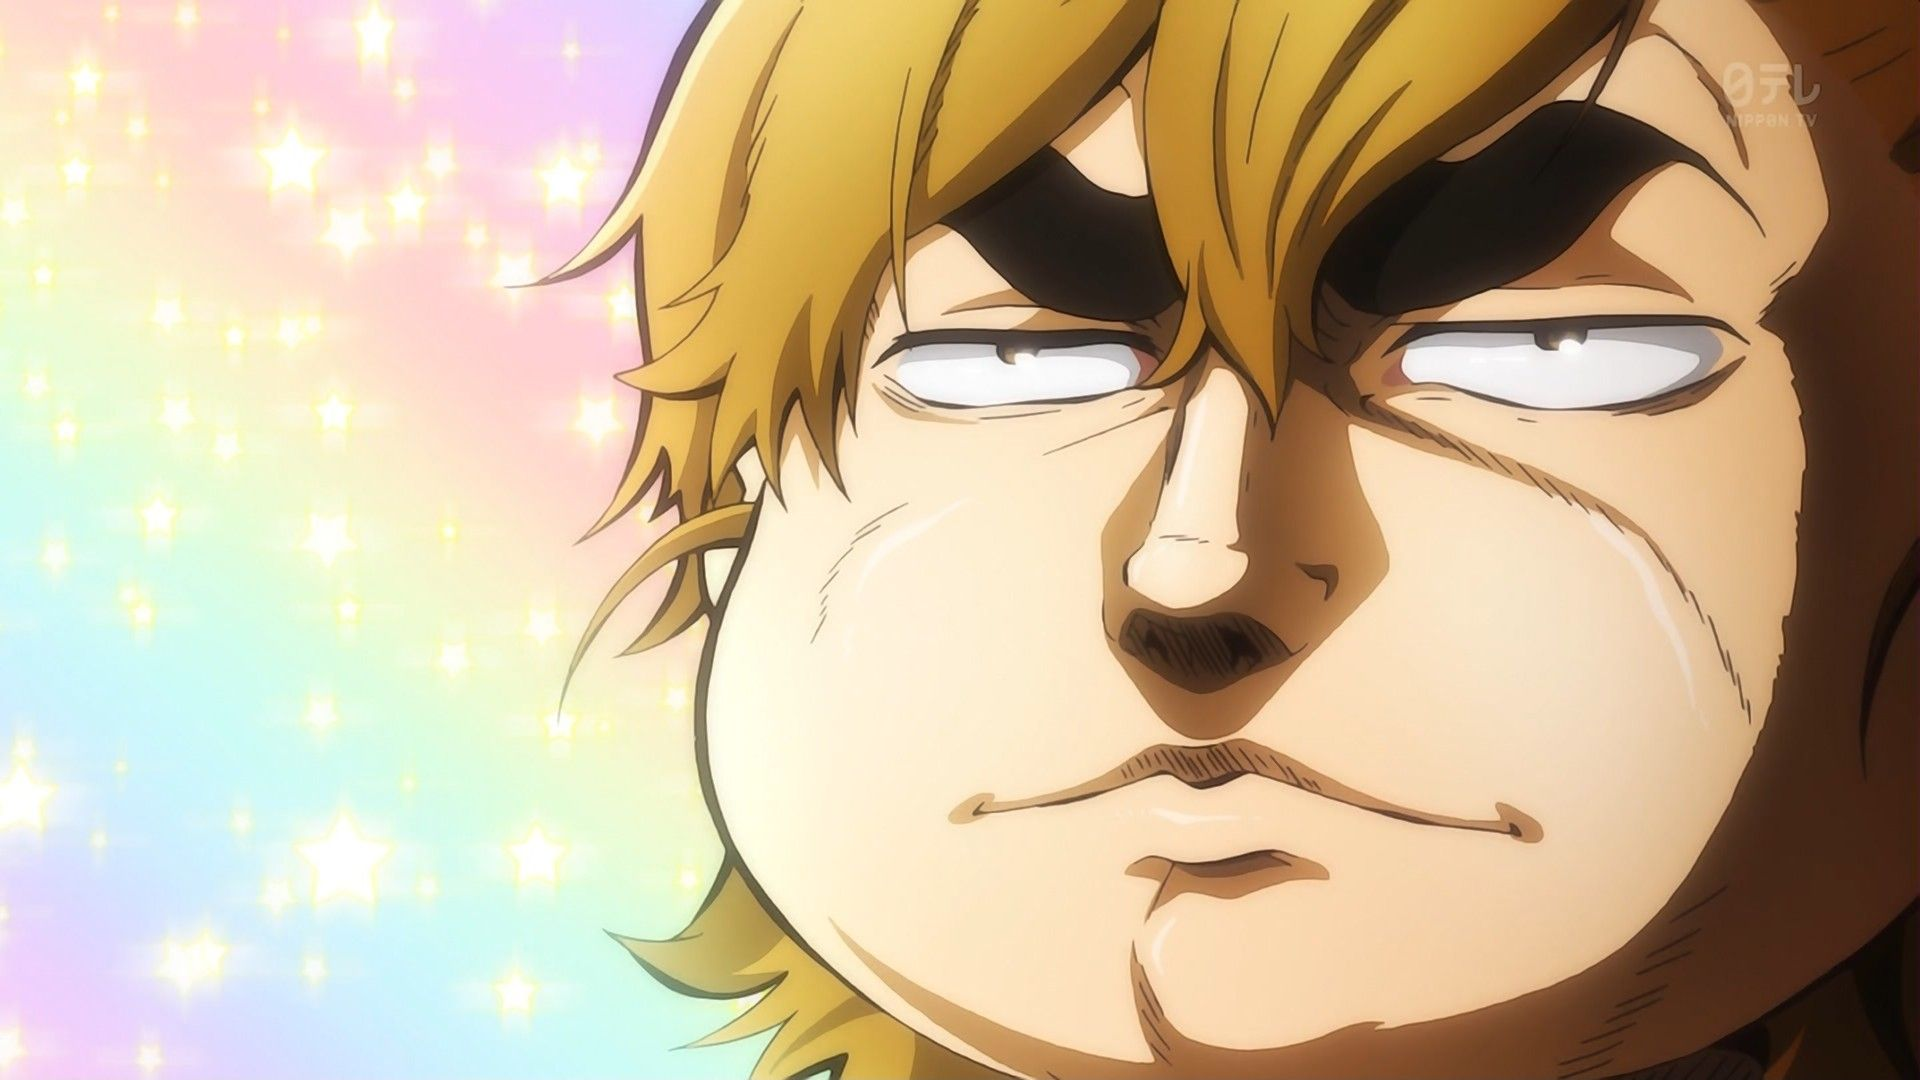 Funny Face Naru Barakamon Anime Wallpaper Barakamon